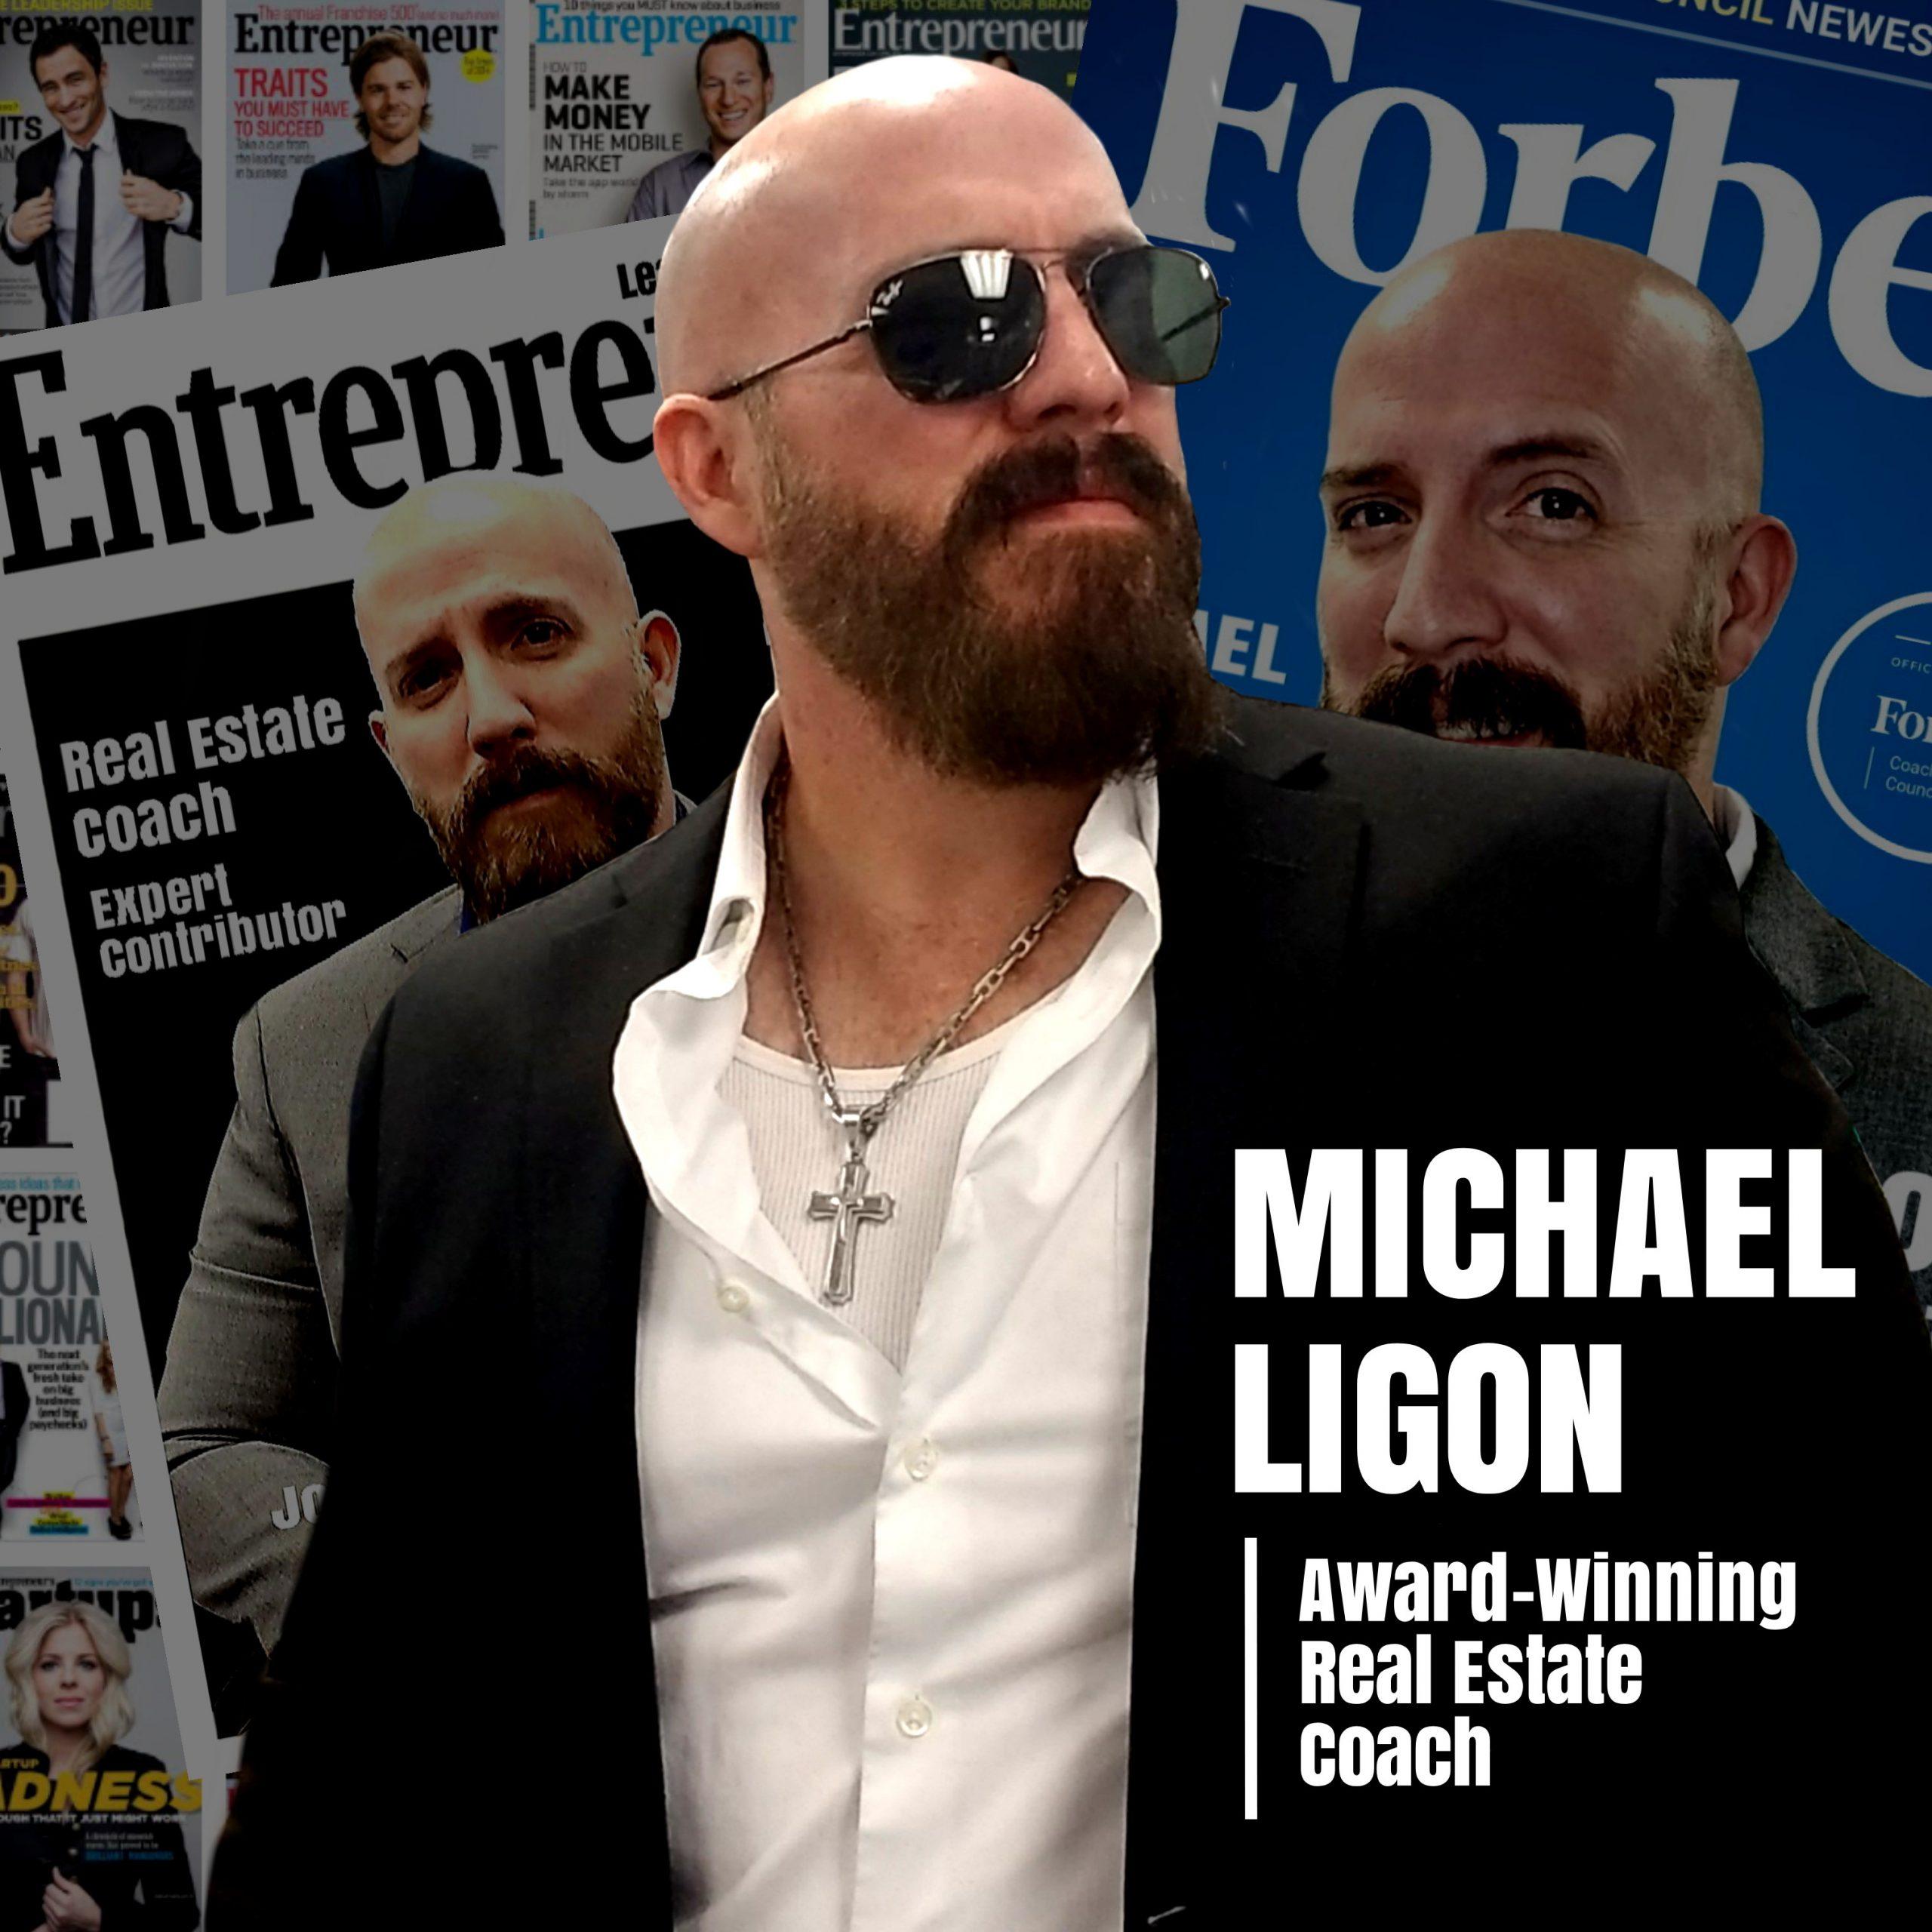 Award-Winning Real Estate Coach Michael Ligon